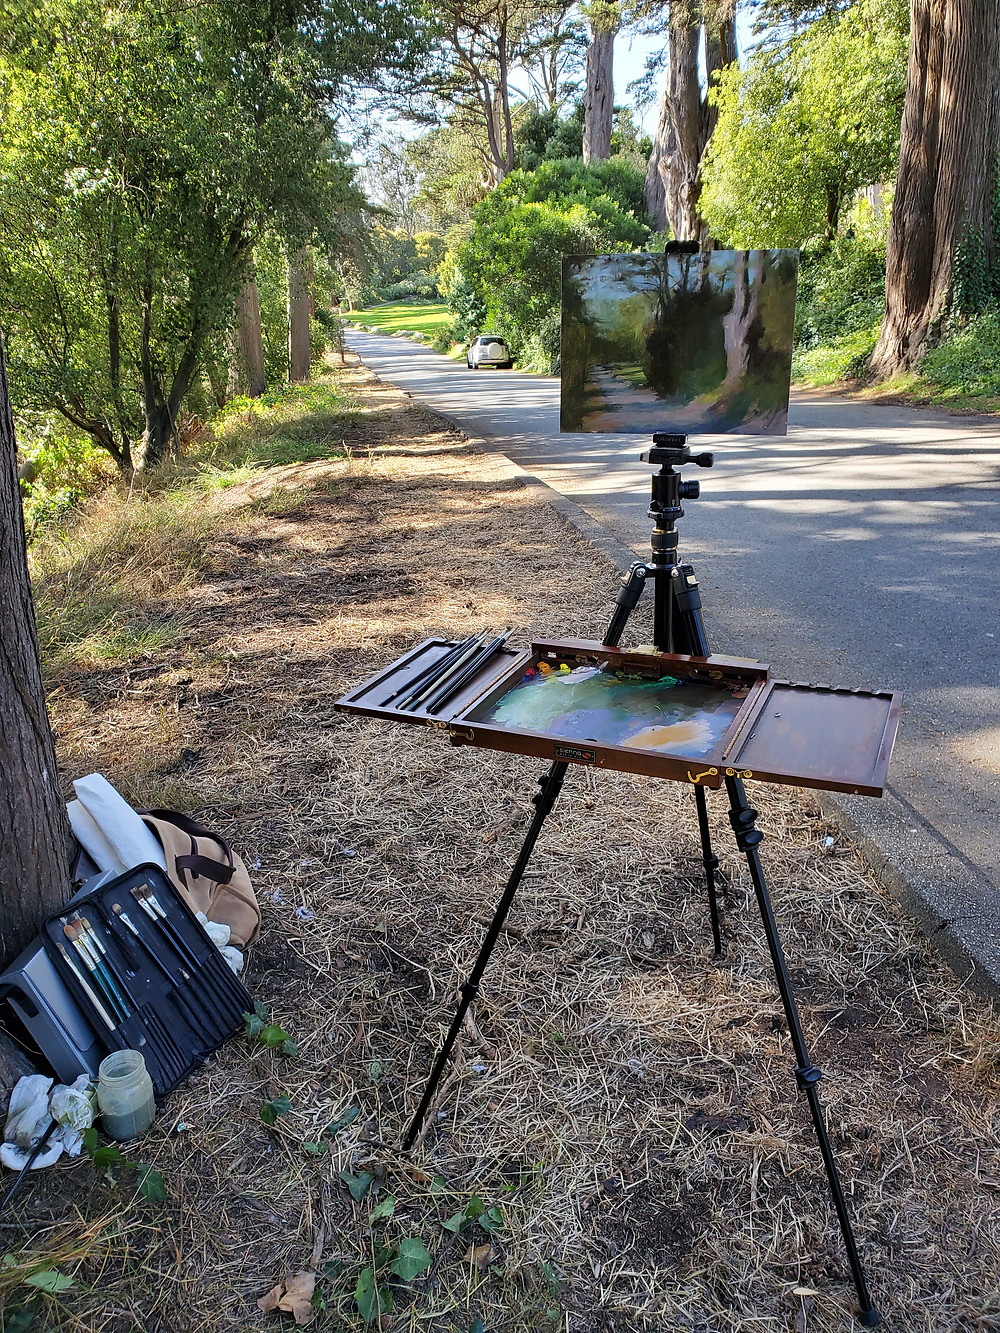 Plein air painting setup - Sadie Valeri